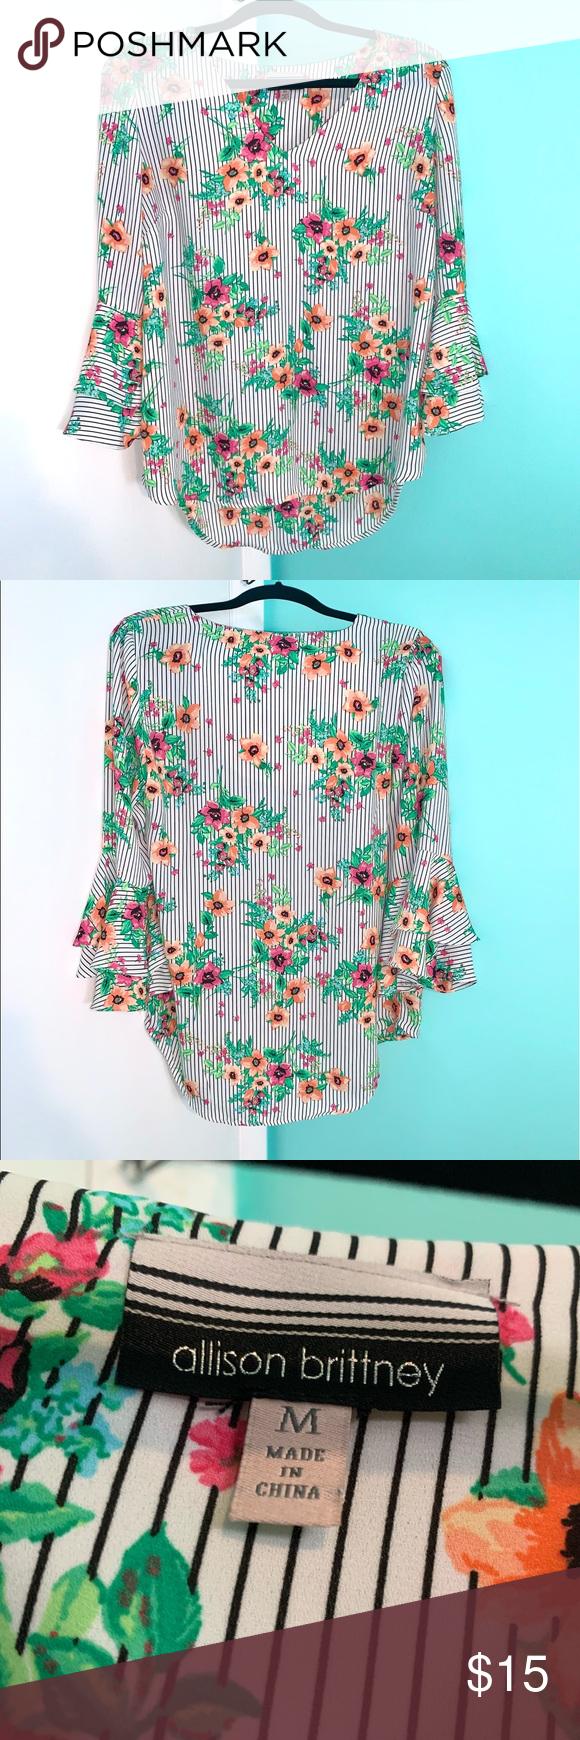 Floral striped blouse Floral striped blouse with ruffled sleeves Allison Brittne…